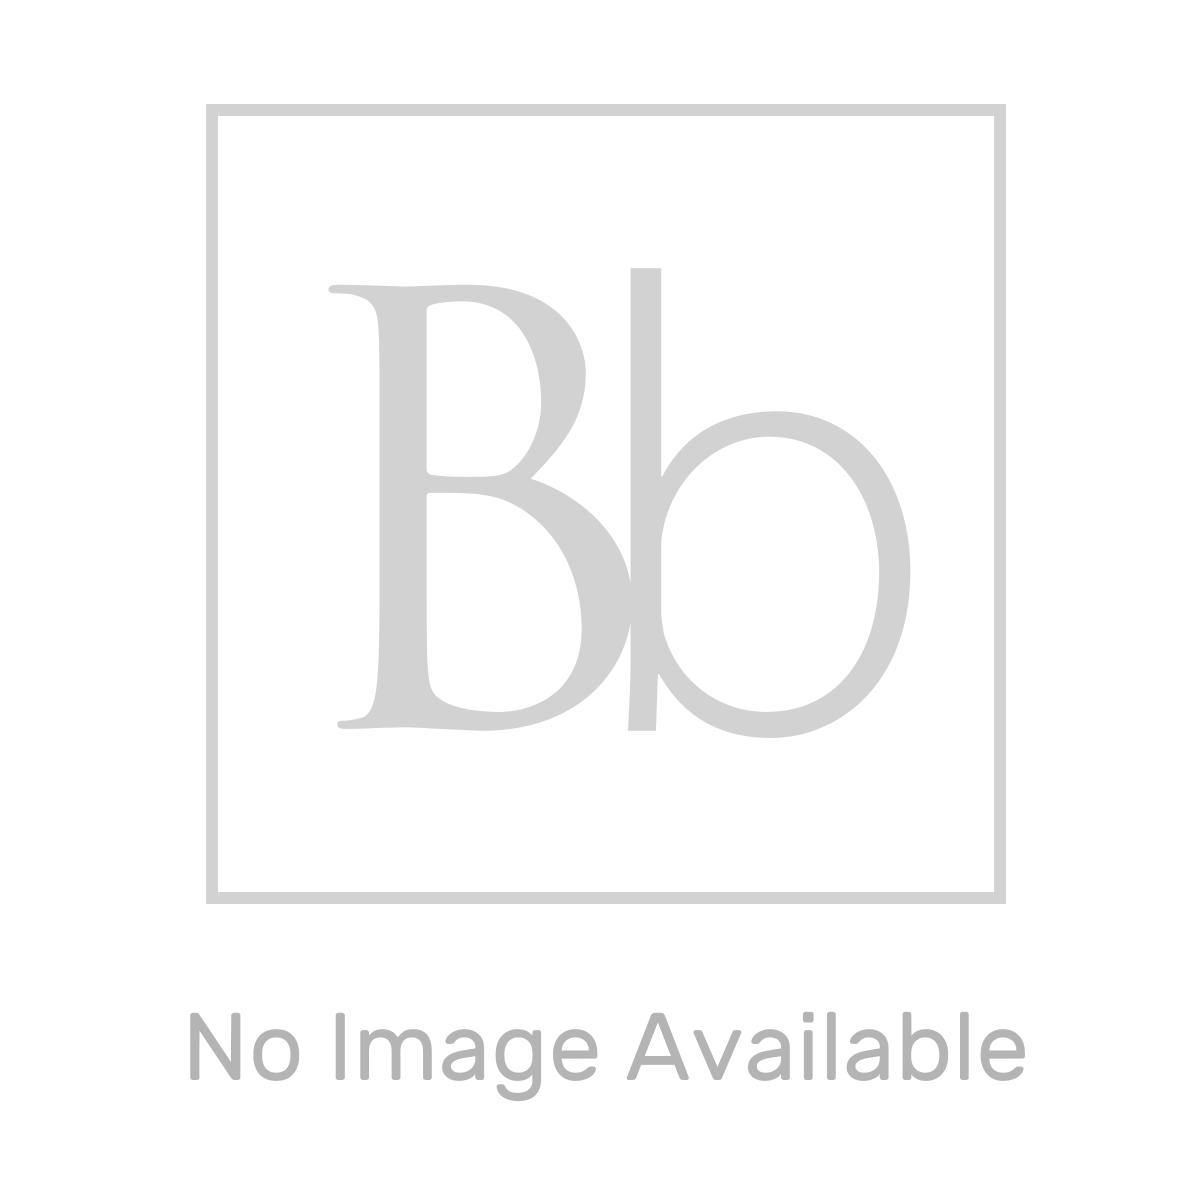 Merlyn MStone Quadrant Shower Tray Panel Set 900mm